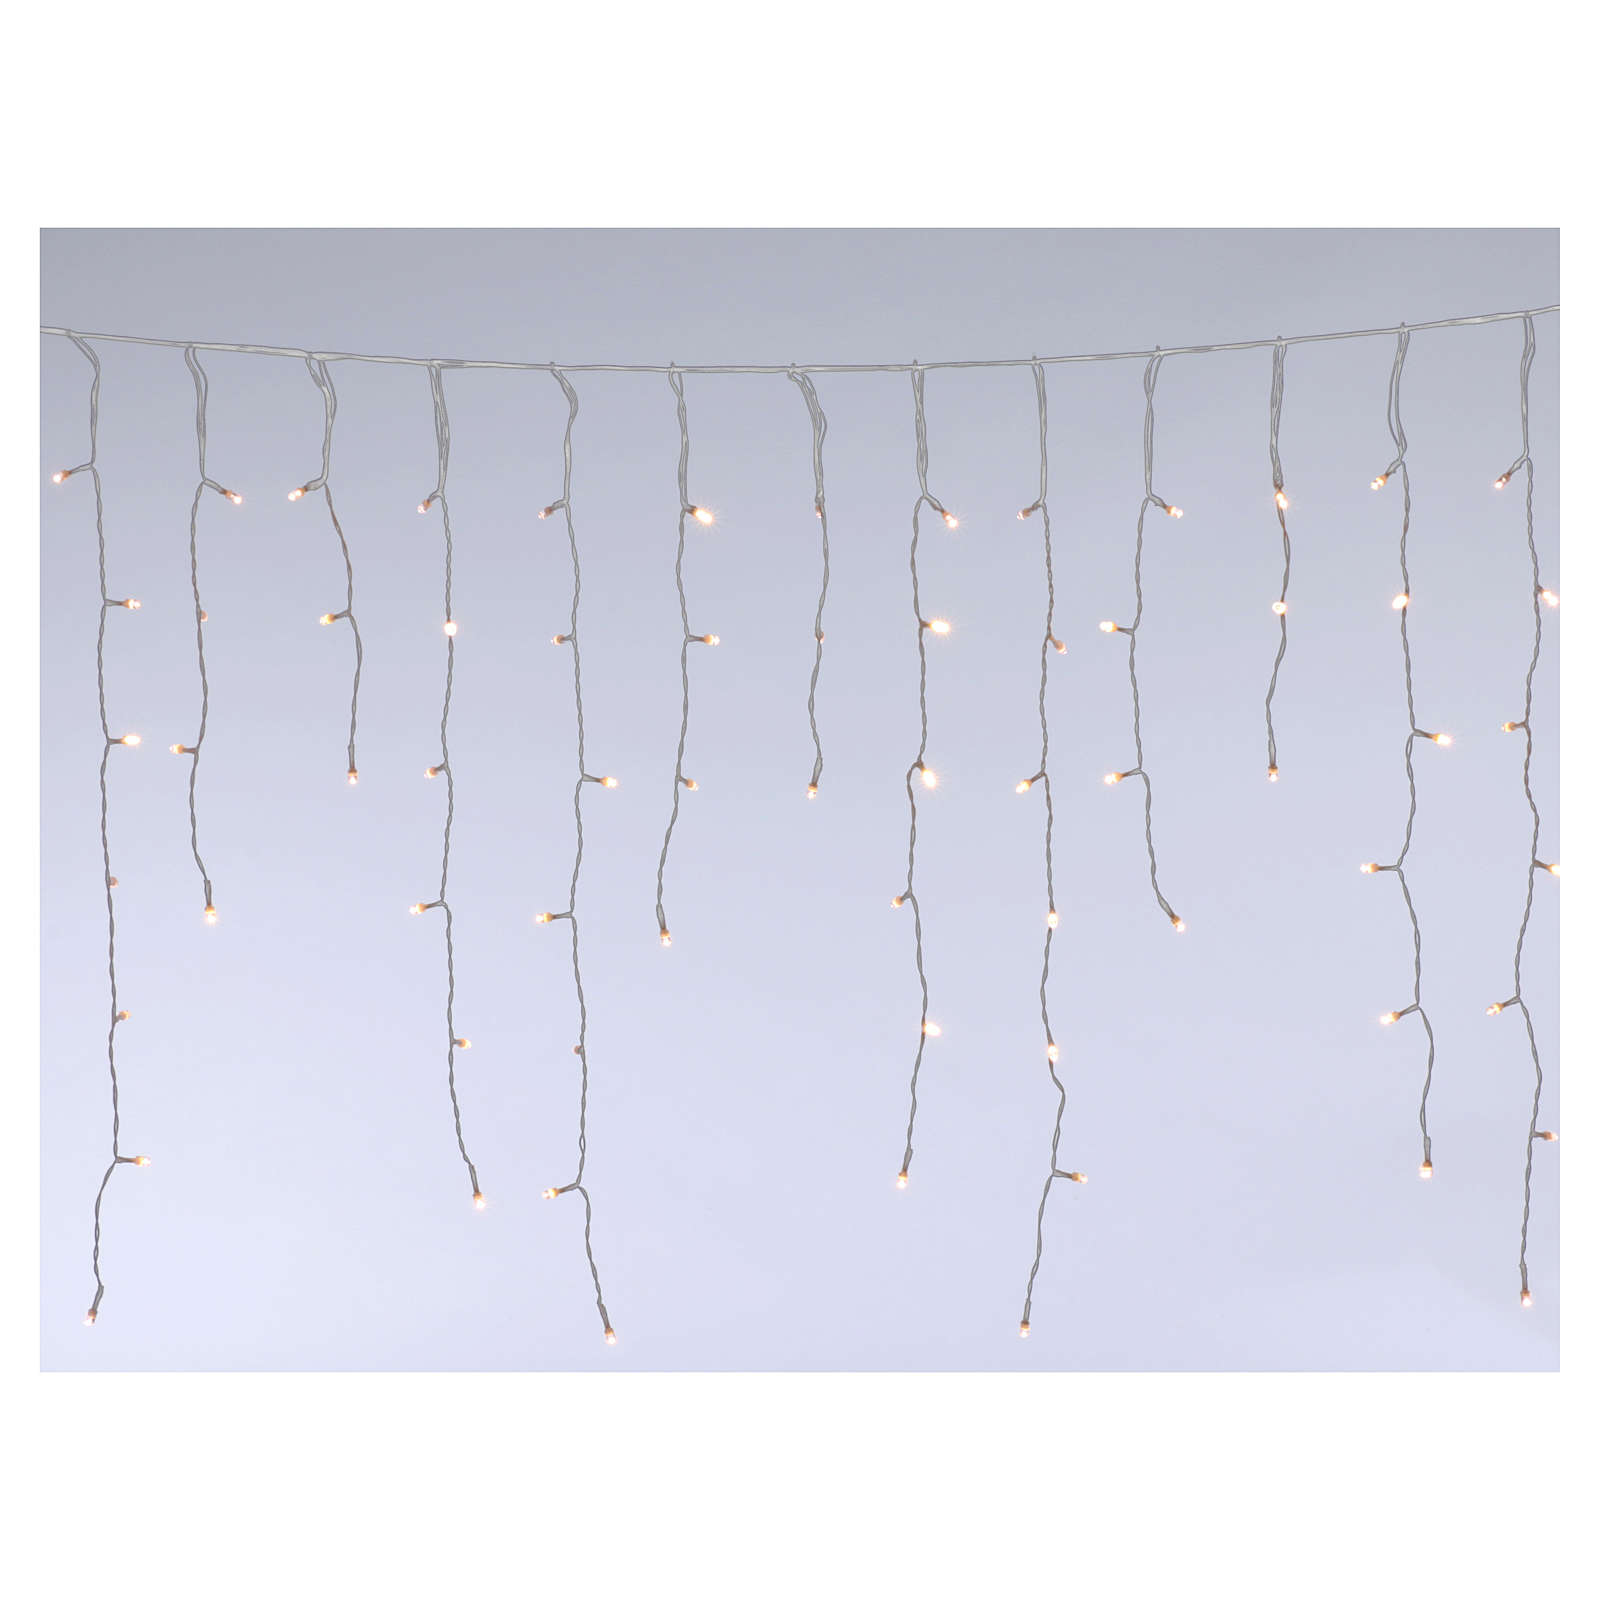 Luce stalattiti 180 Mega Led bianco caldo interno esterno 3